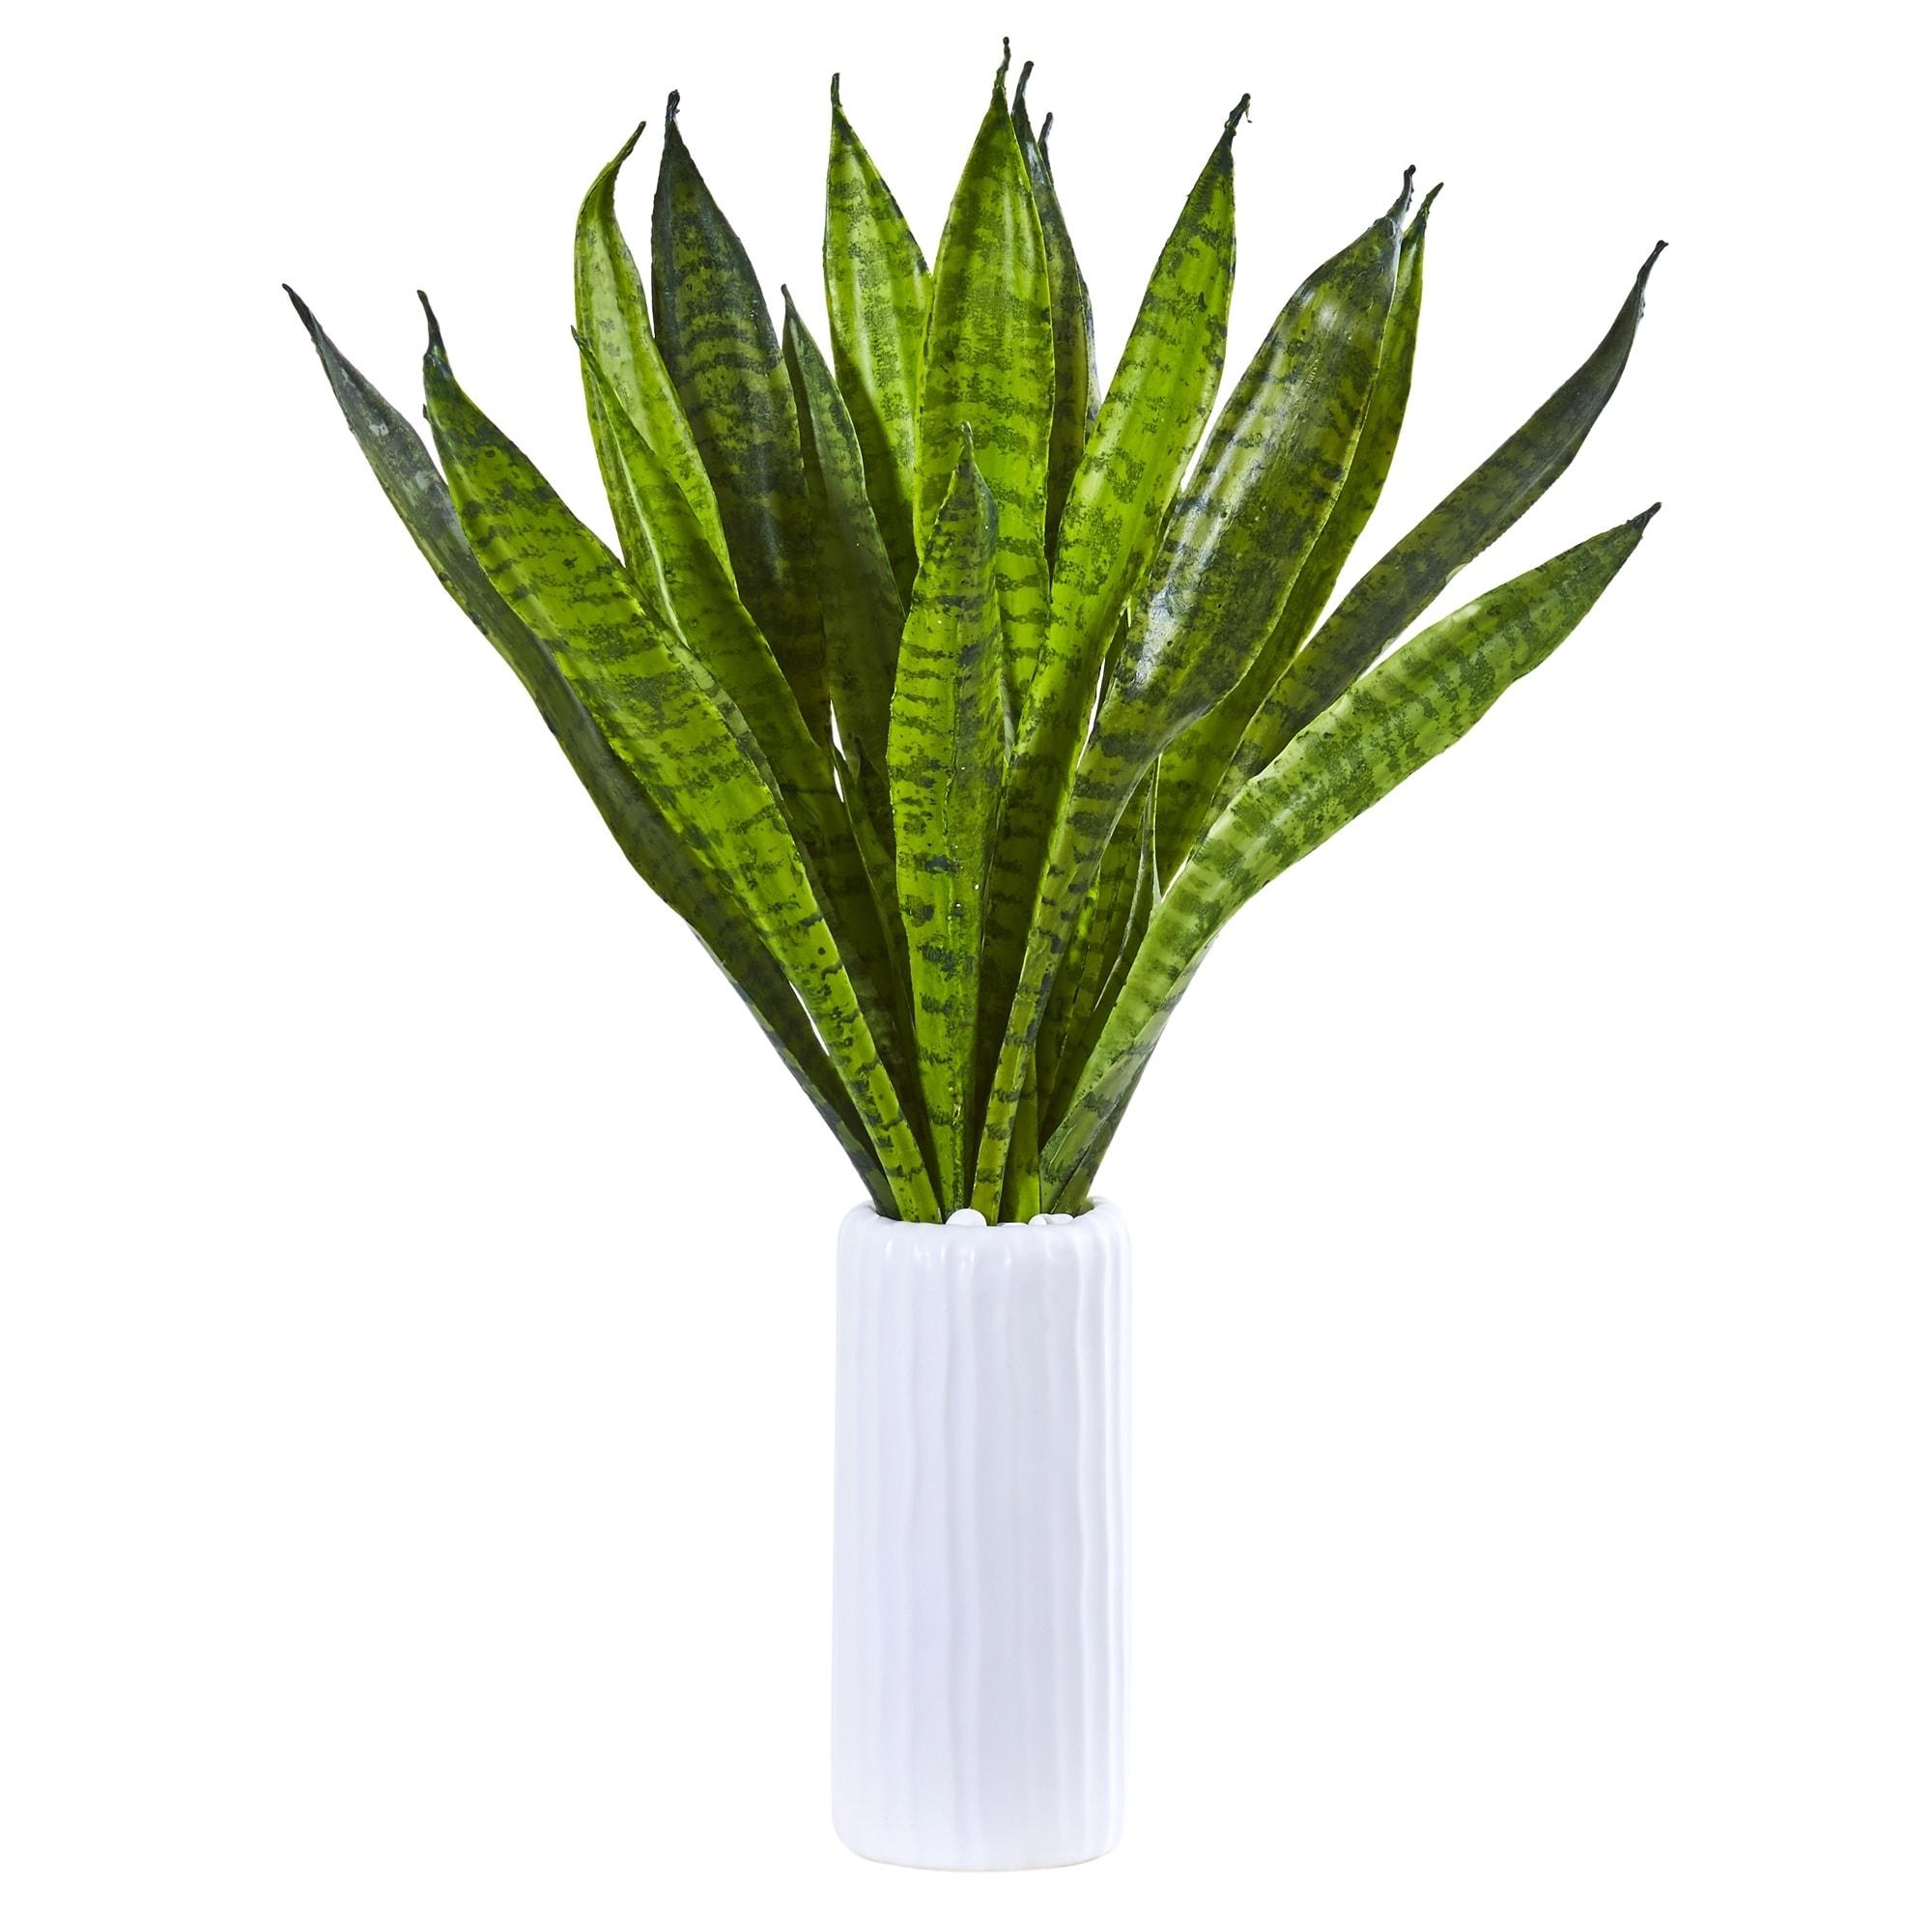 22 Sansevieria Artificial Plant in White Vase